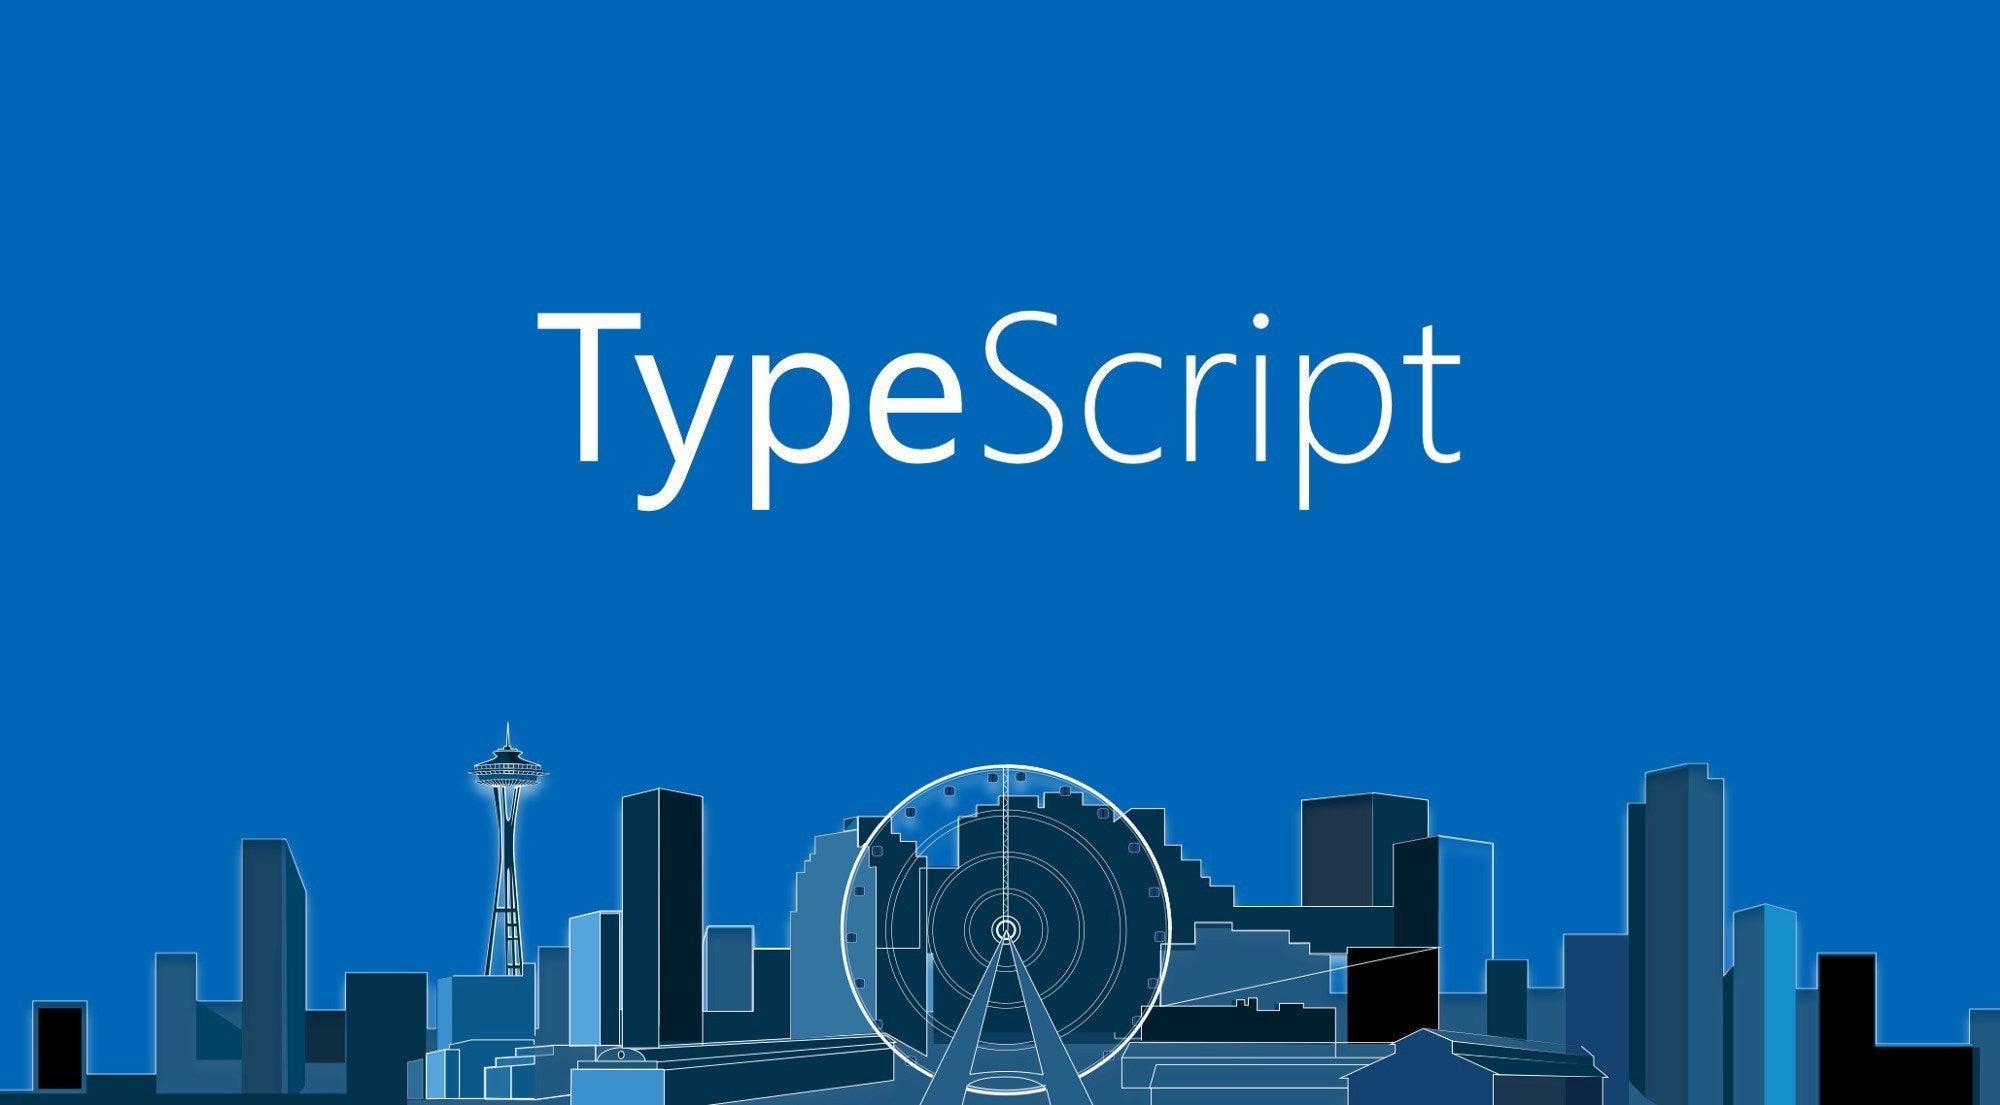 TypeScript Logo above the Seattle Skyline